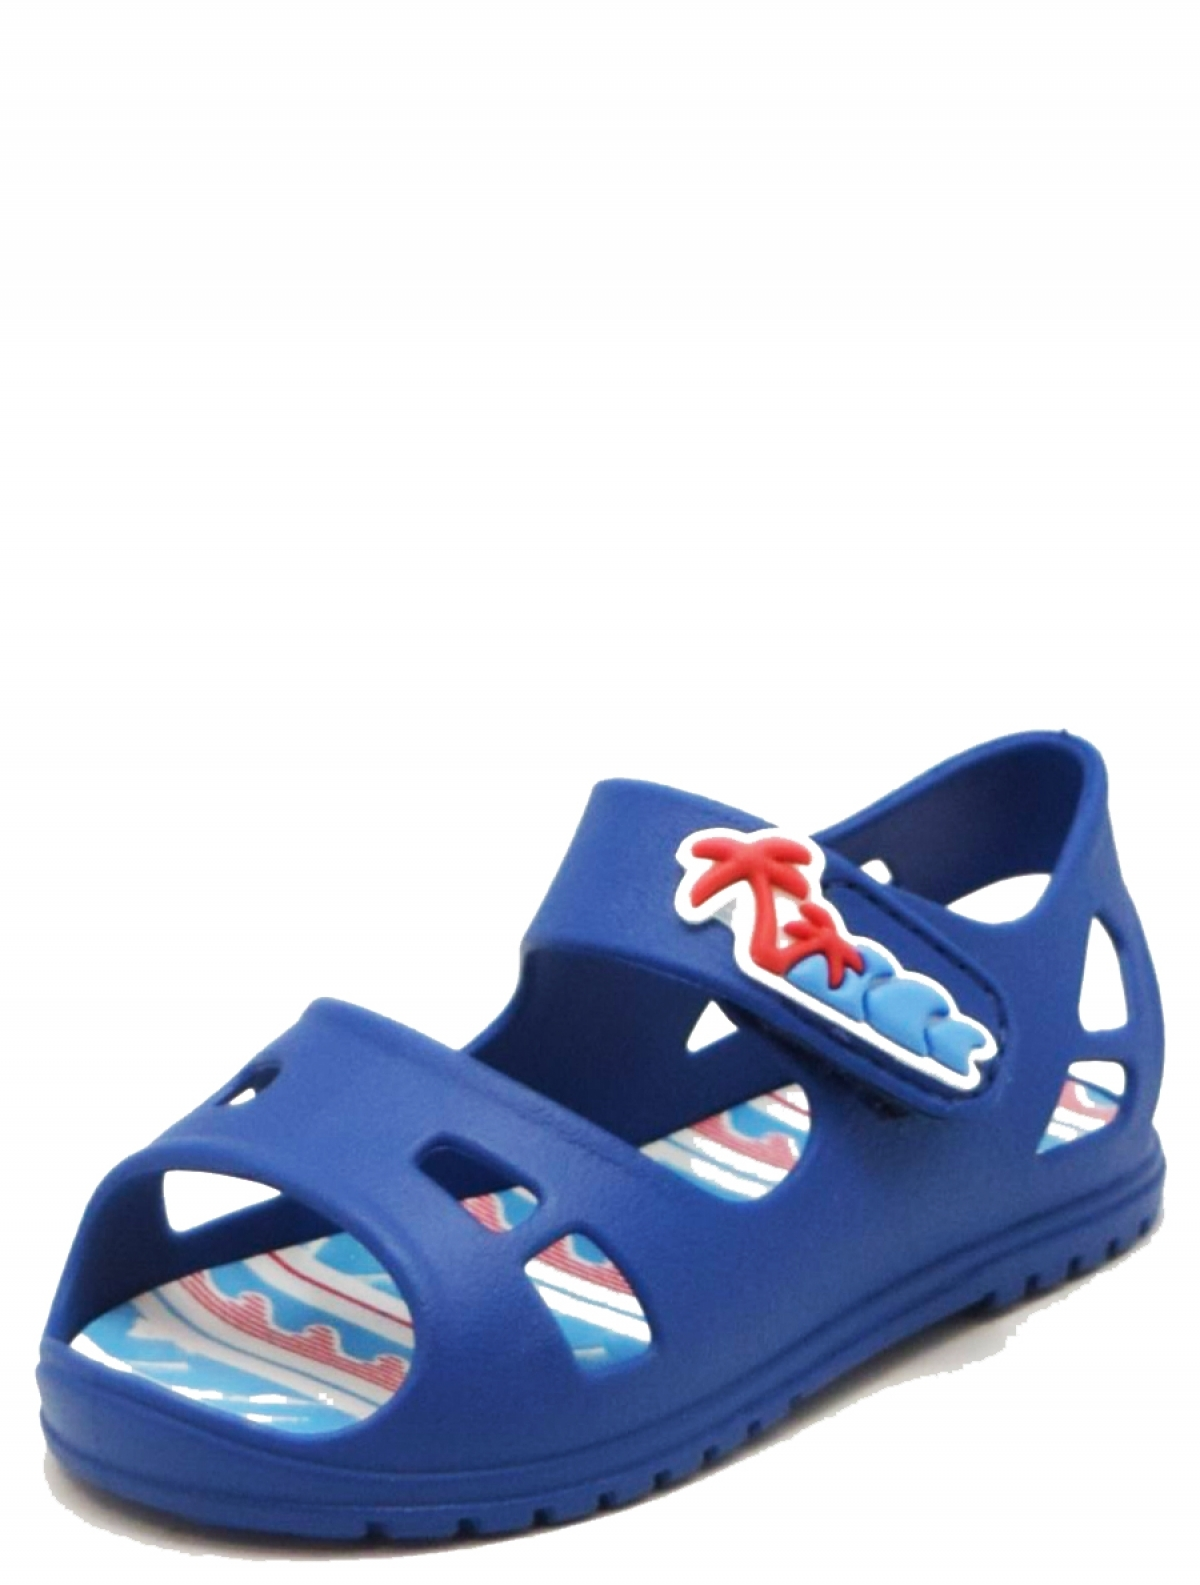 Pimpolho 32510 сандали для мальчика